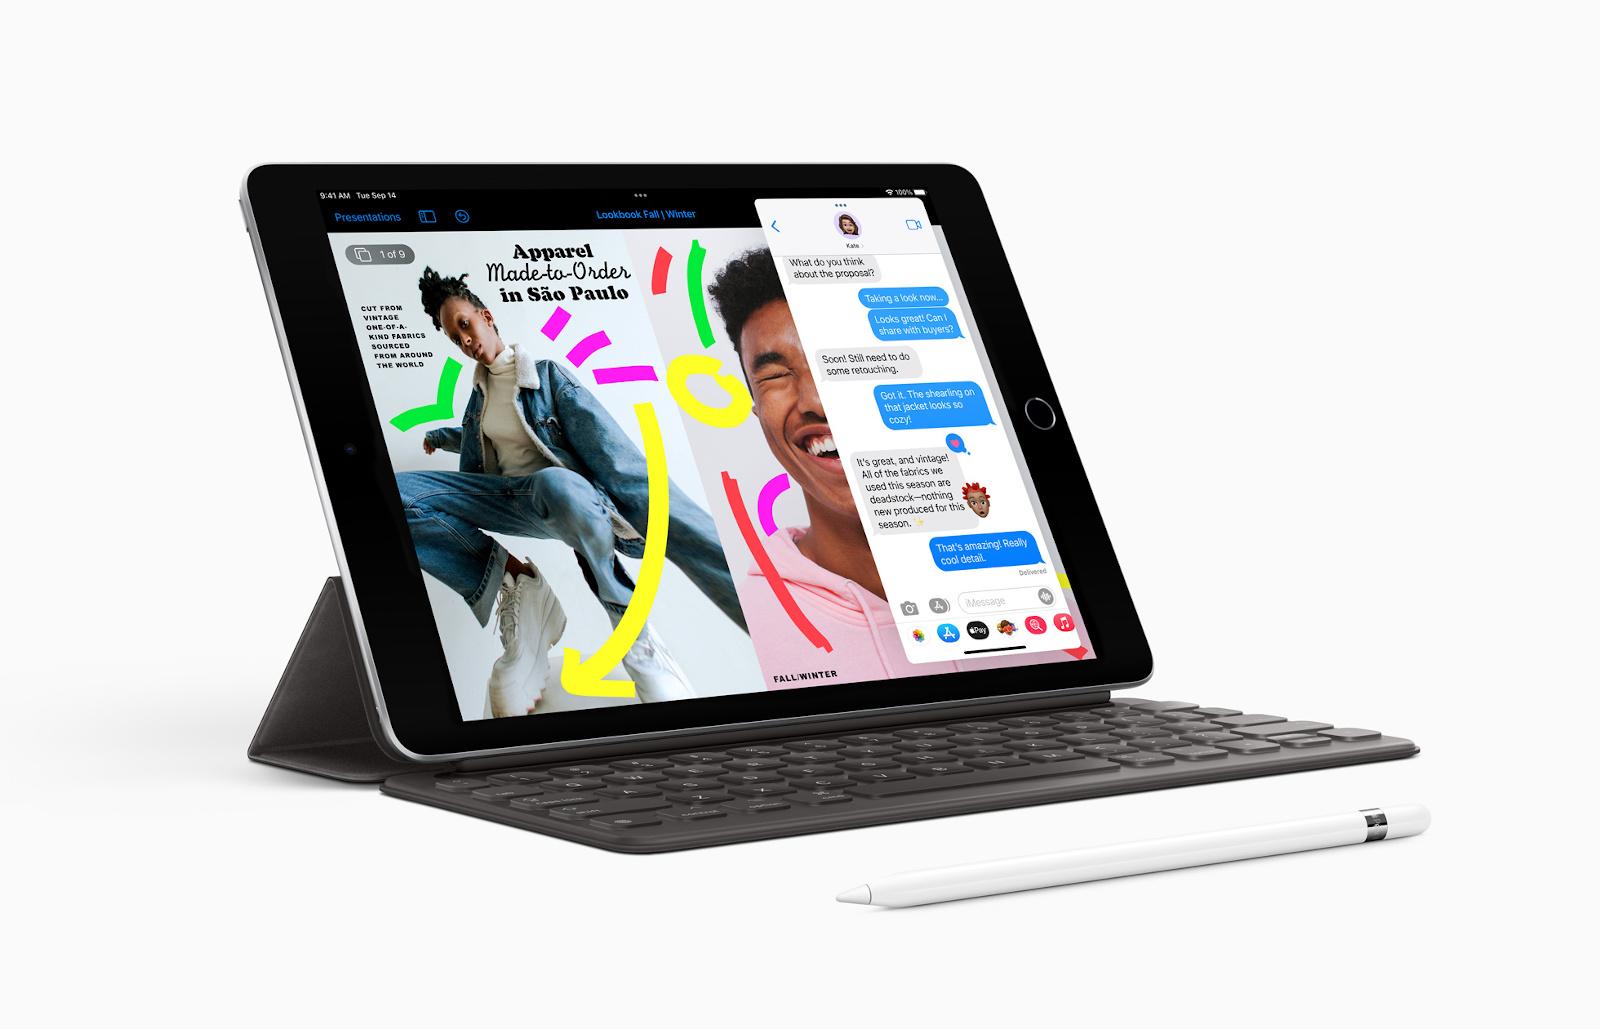 Apple's 2021 iPad is already $30 off at Walmart